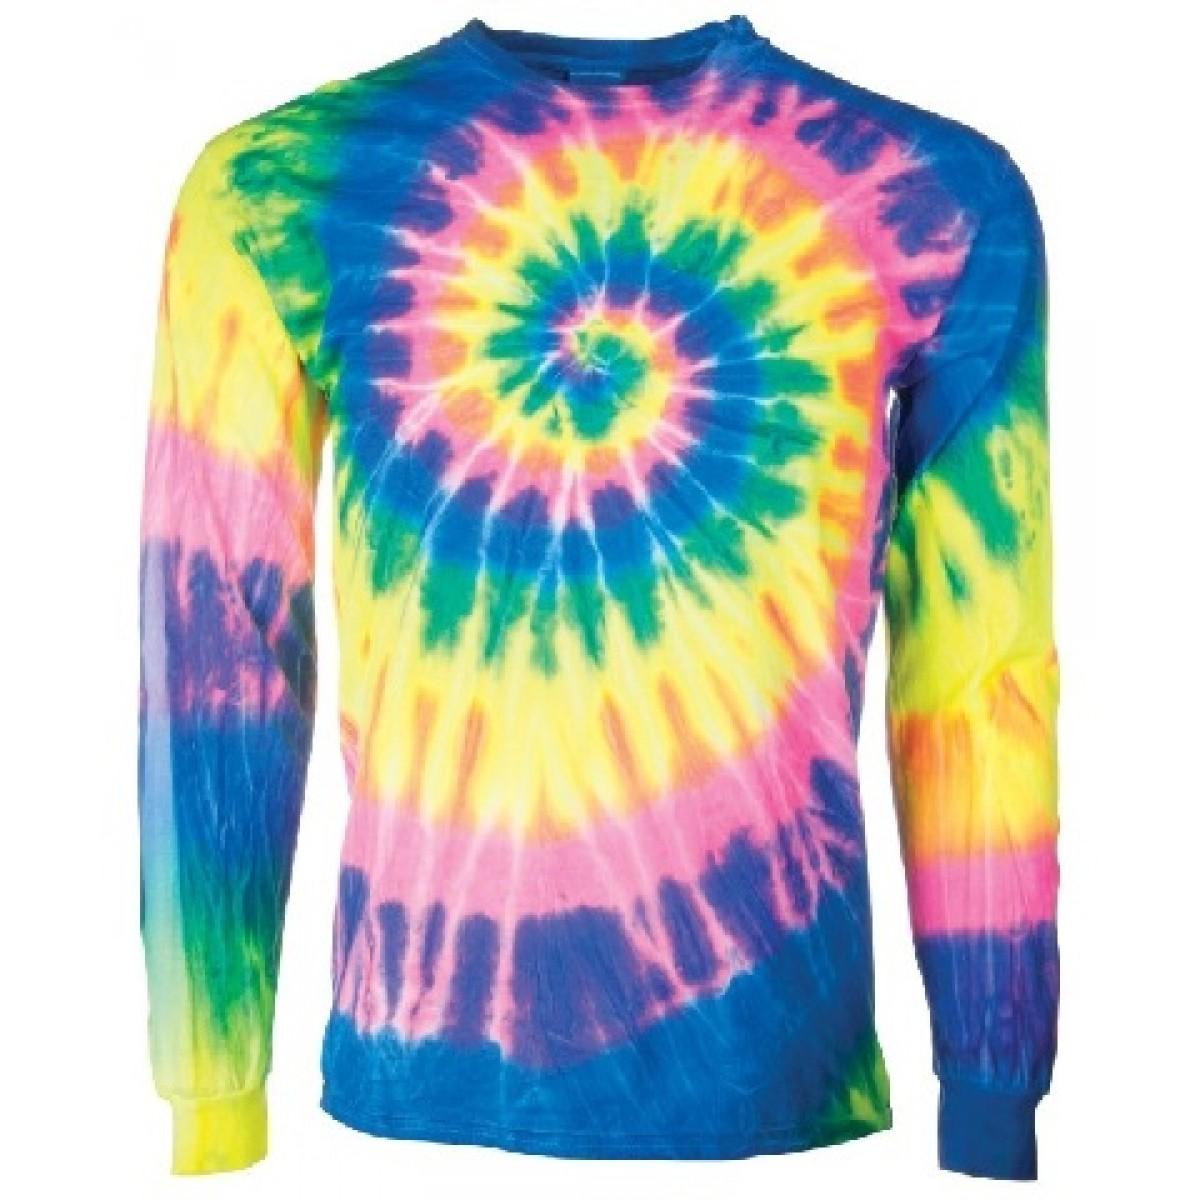 Spiral Tie Dye Long Sleeve Flo Rainbow-Rainbow-XL